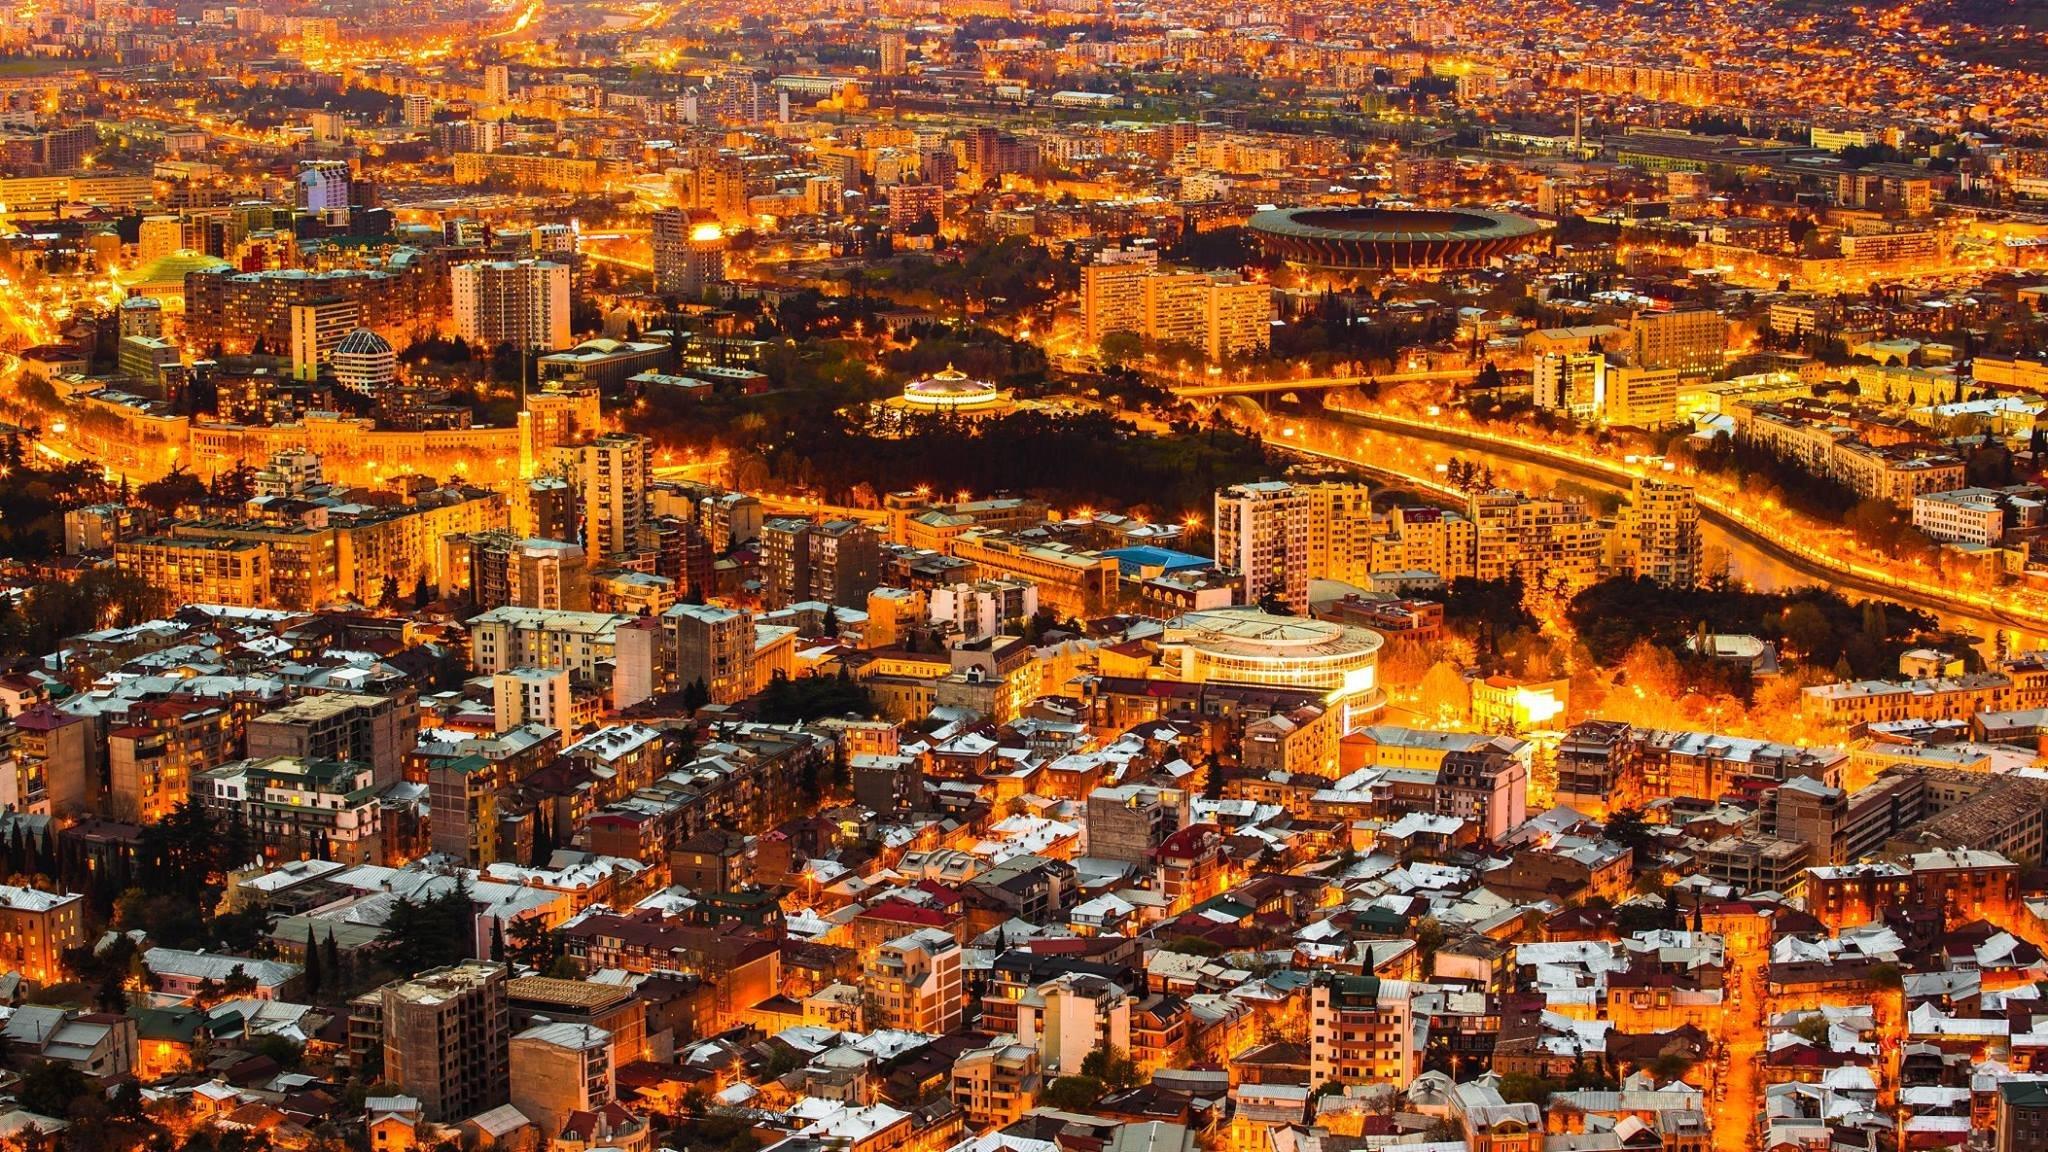 Оранжевый Тбилиси, фото Томаса Вахе